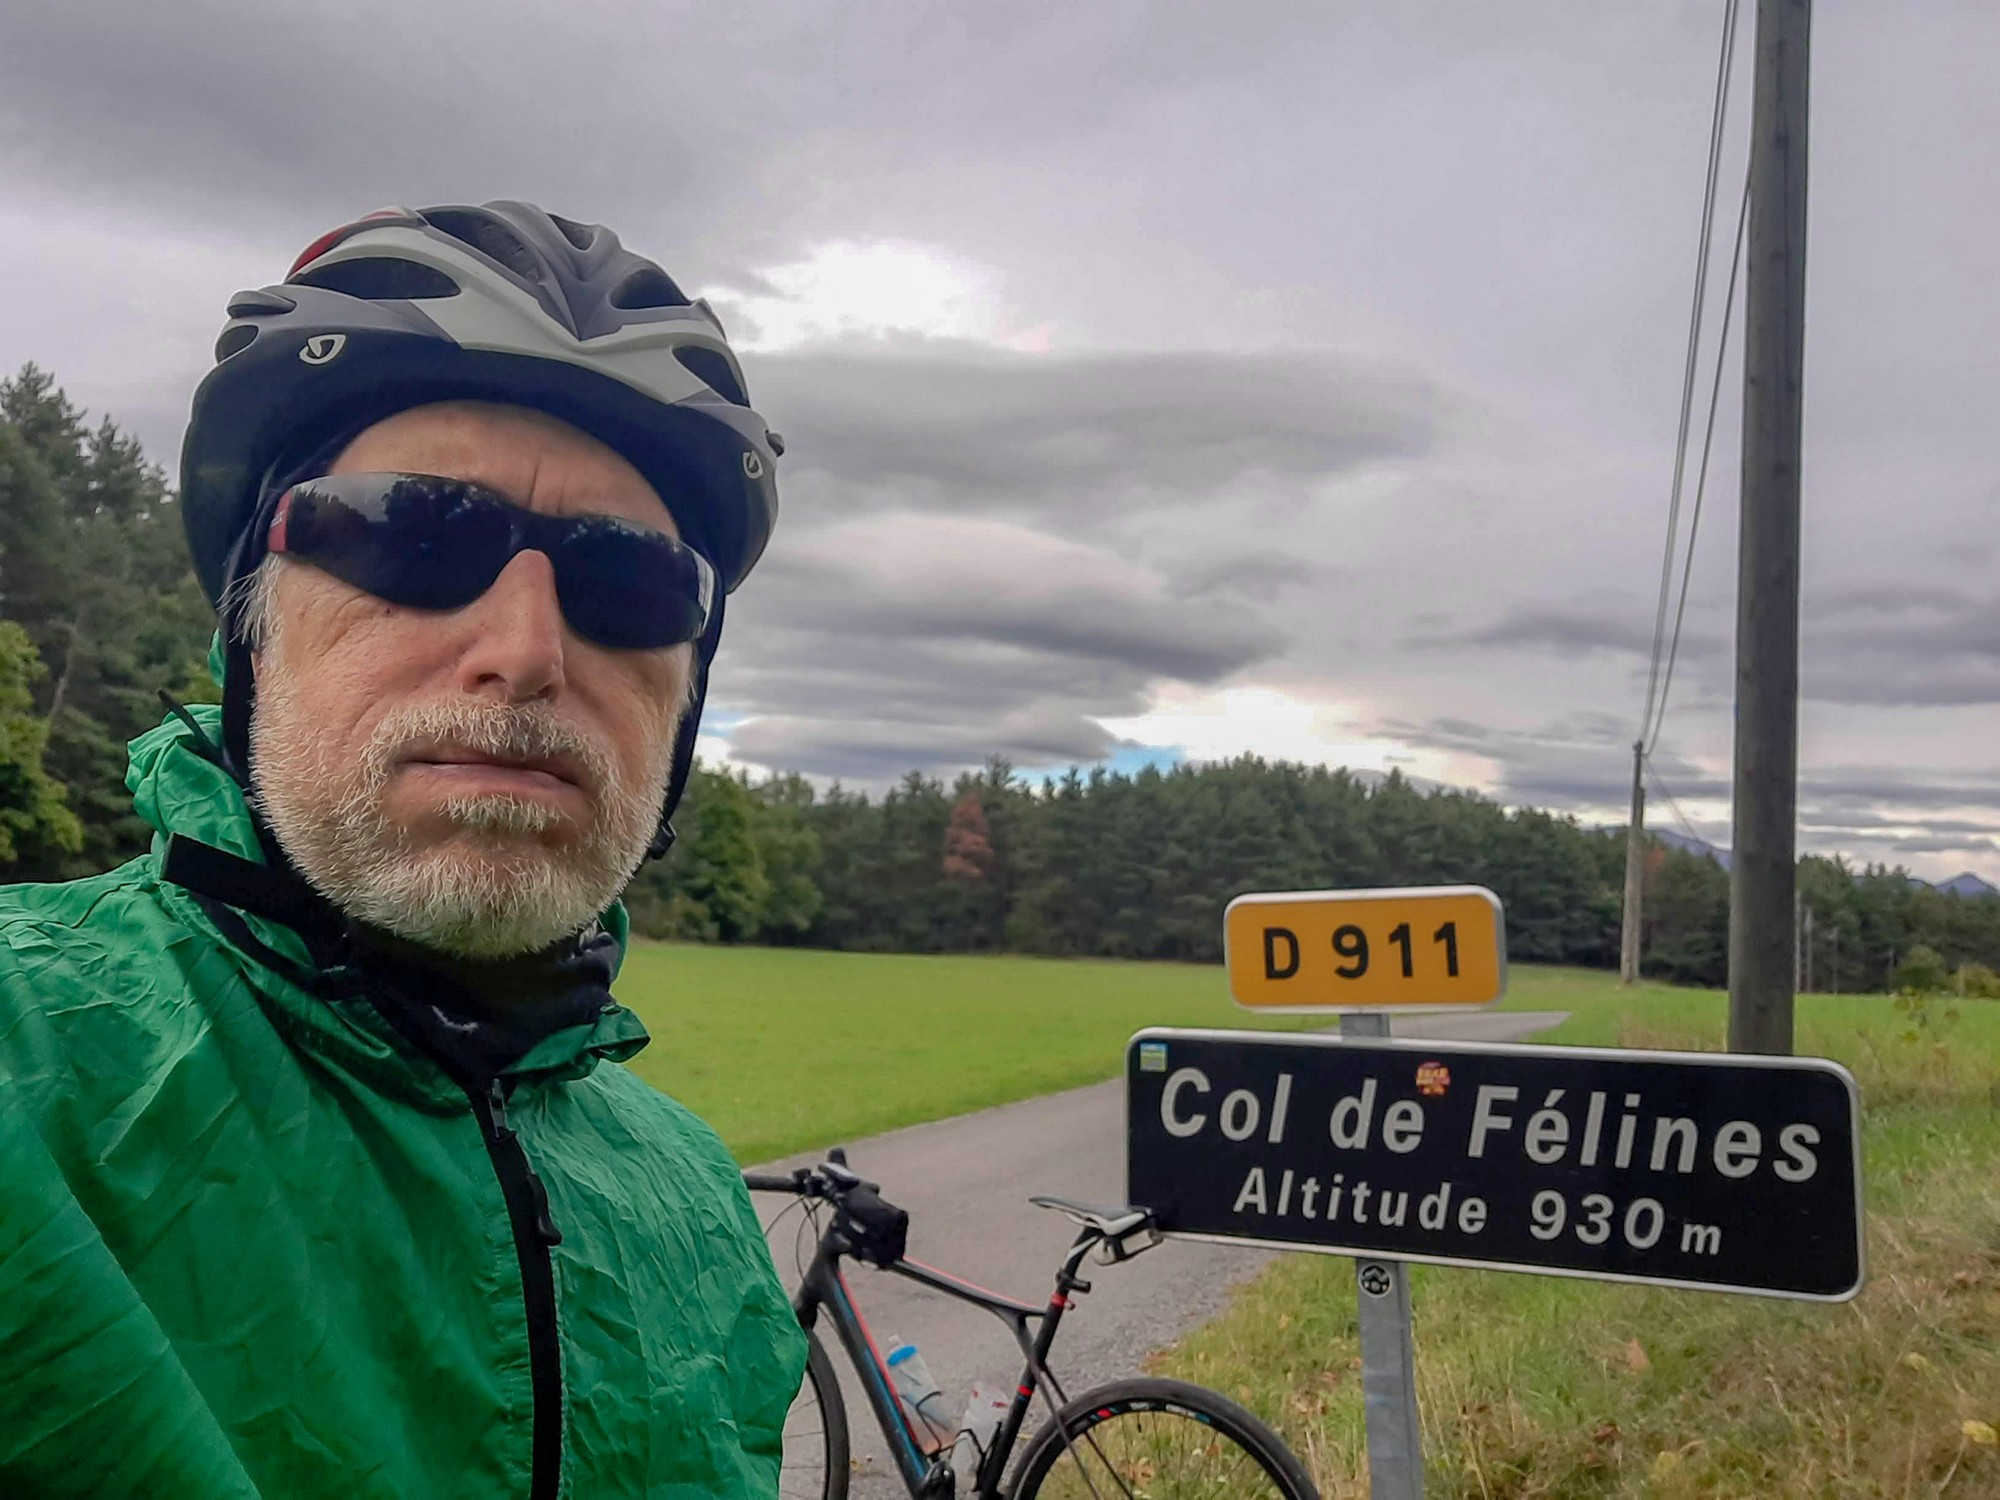 Col de Félines